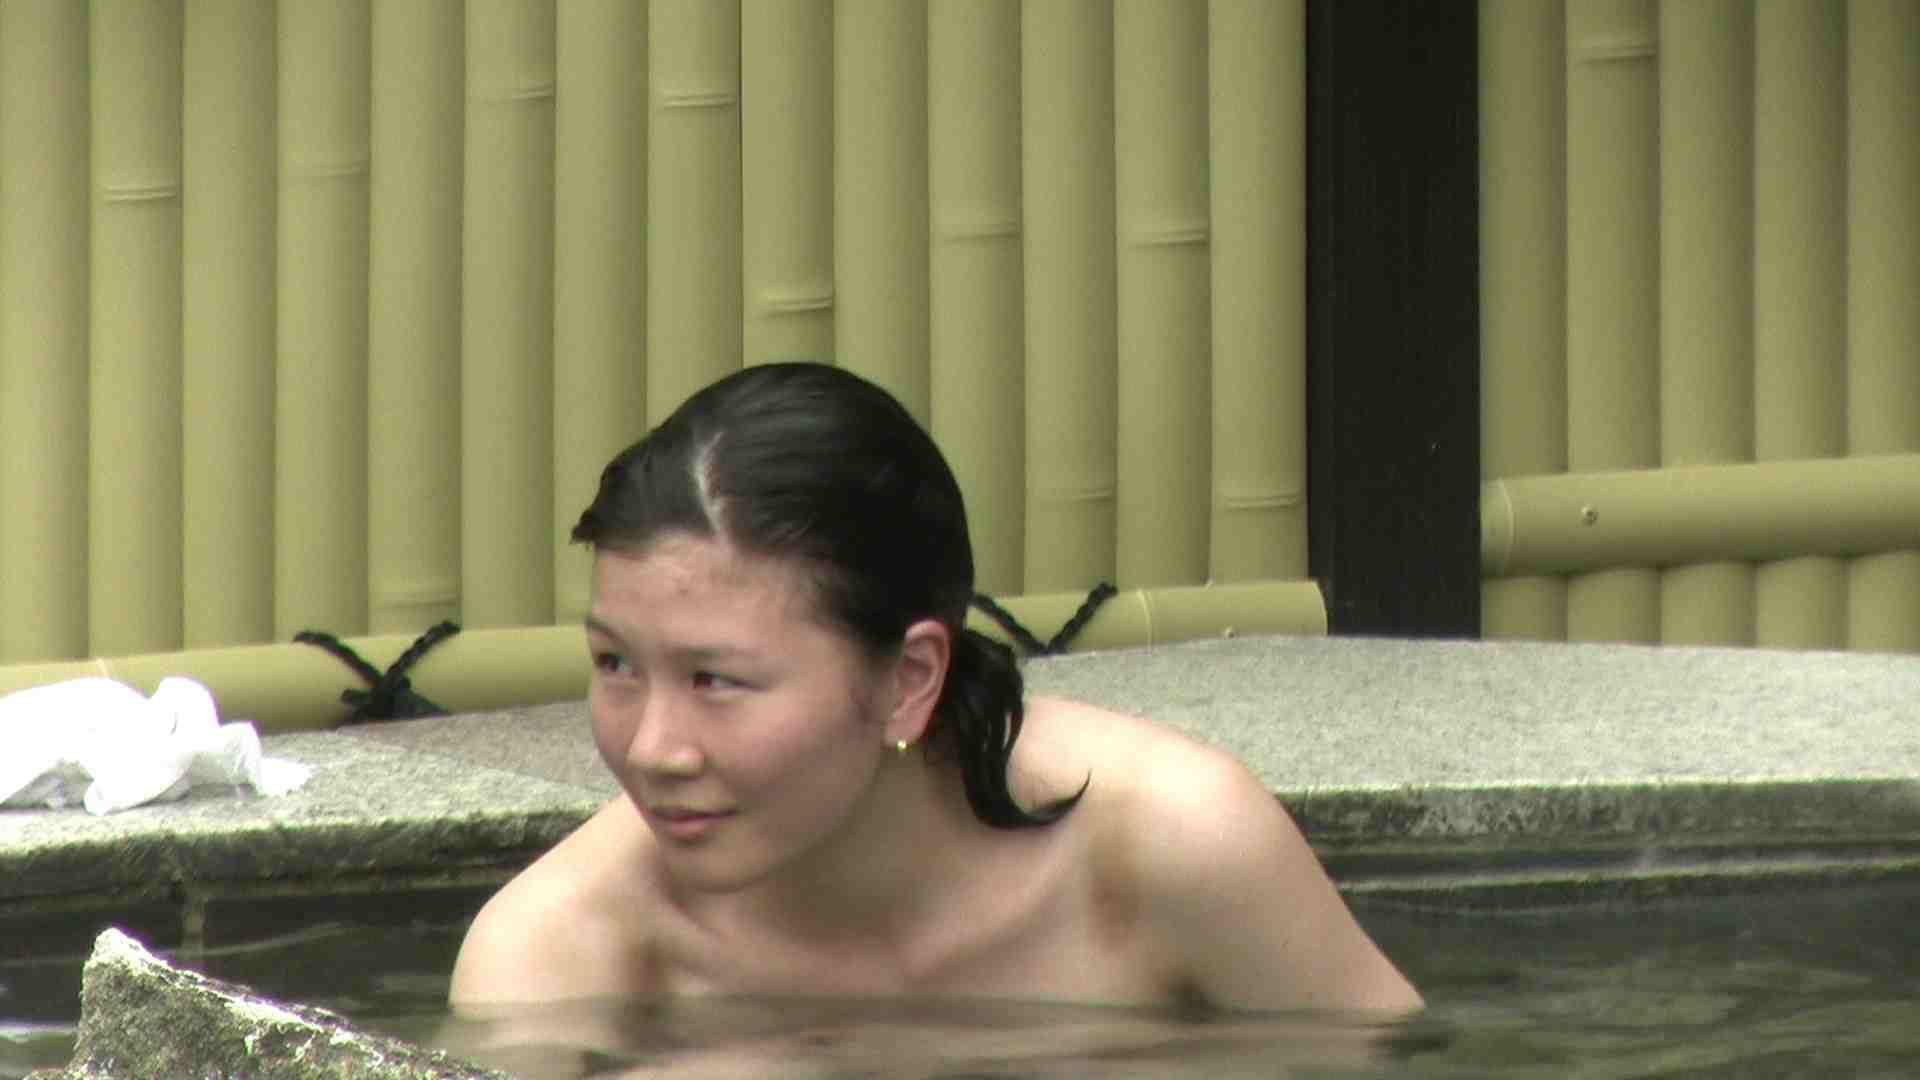 Aquaな露天風呂Vol.187 盗撮   HなOL  96pic 51